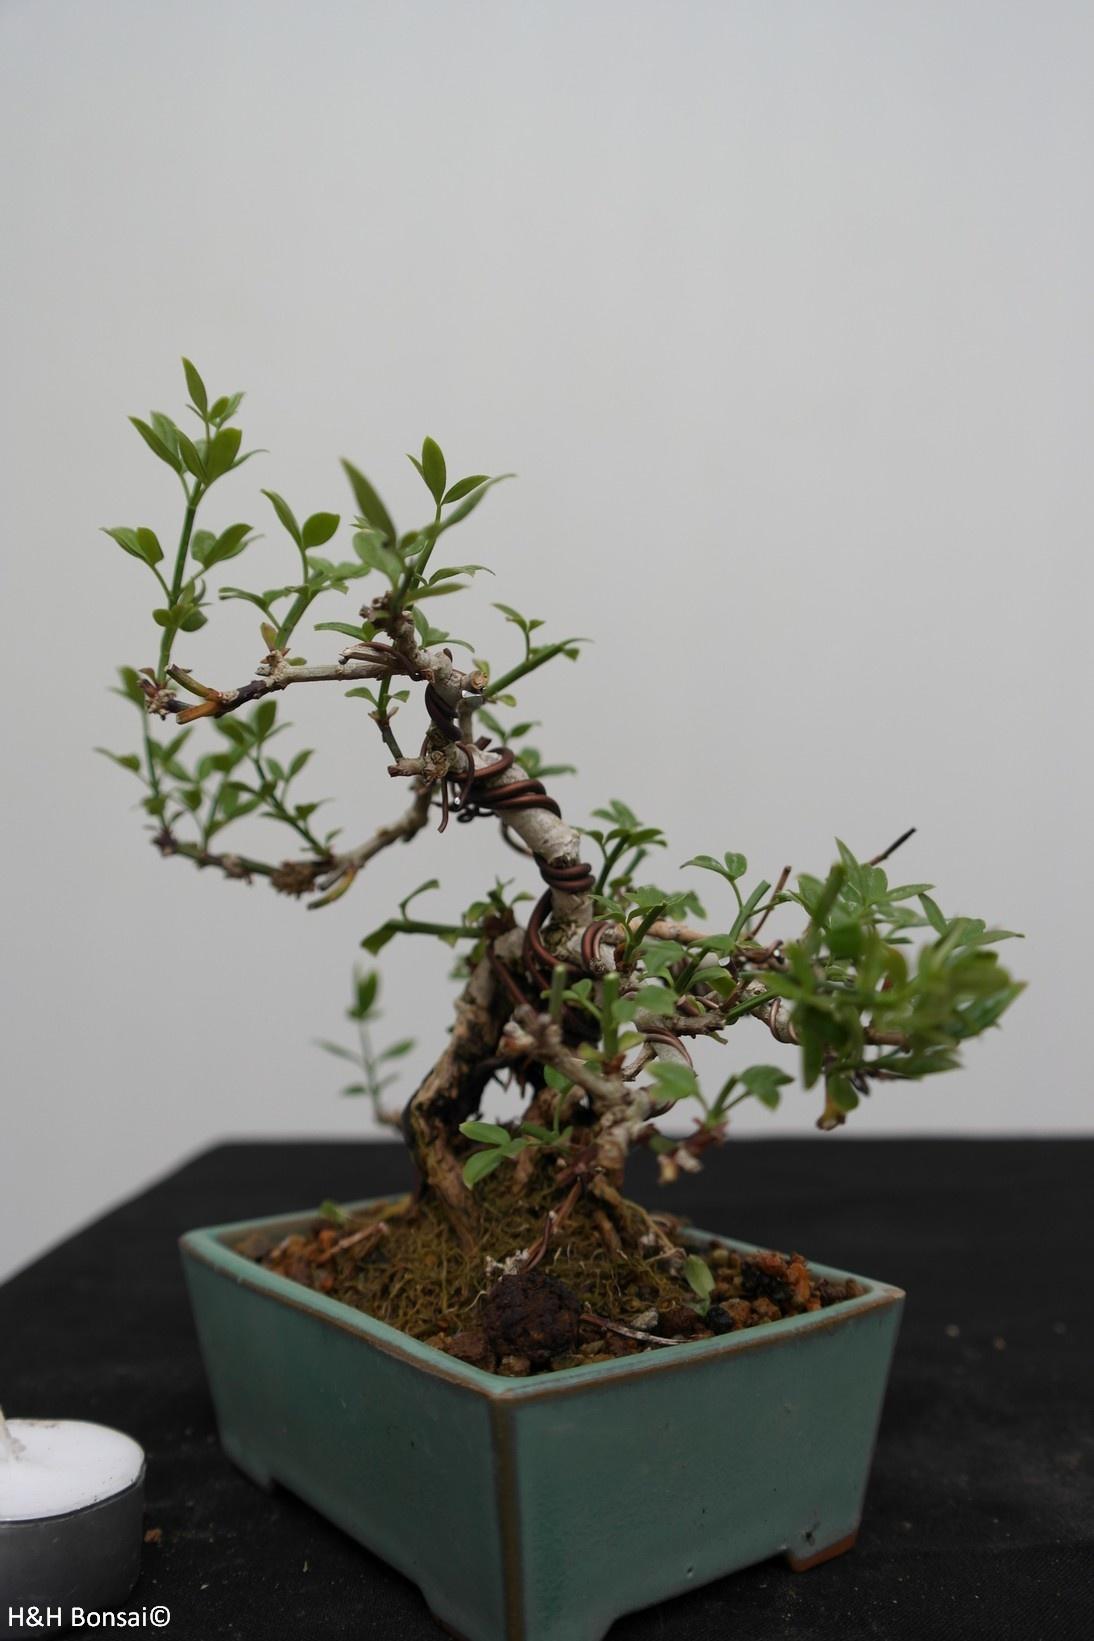 Bonsai Shohin Winter Jasmine Jasminum Nudiflorum No 7528 Www Henhbonsai Nl